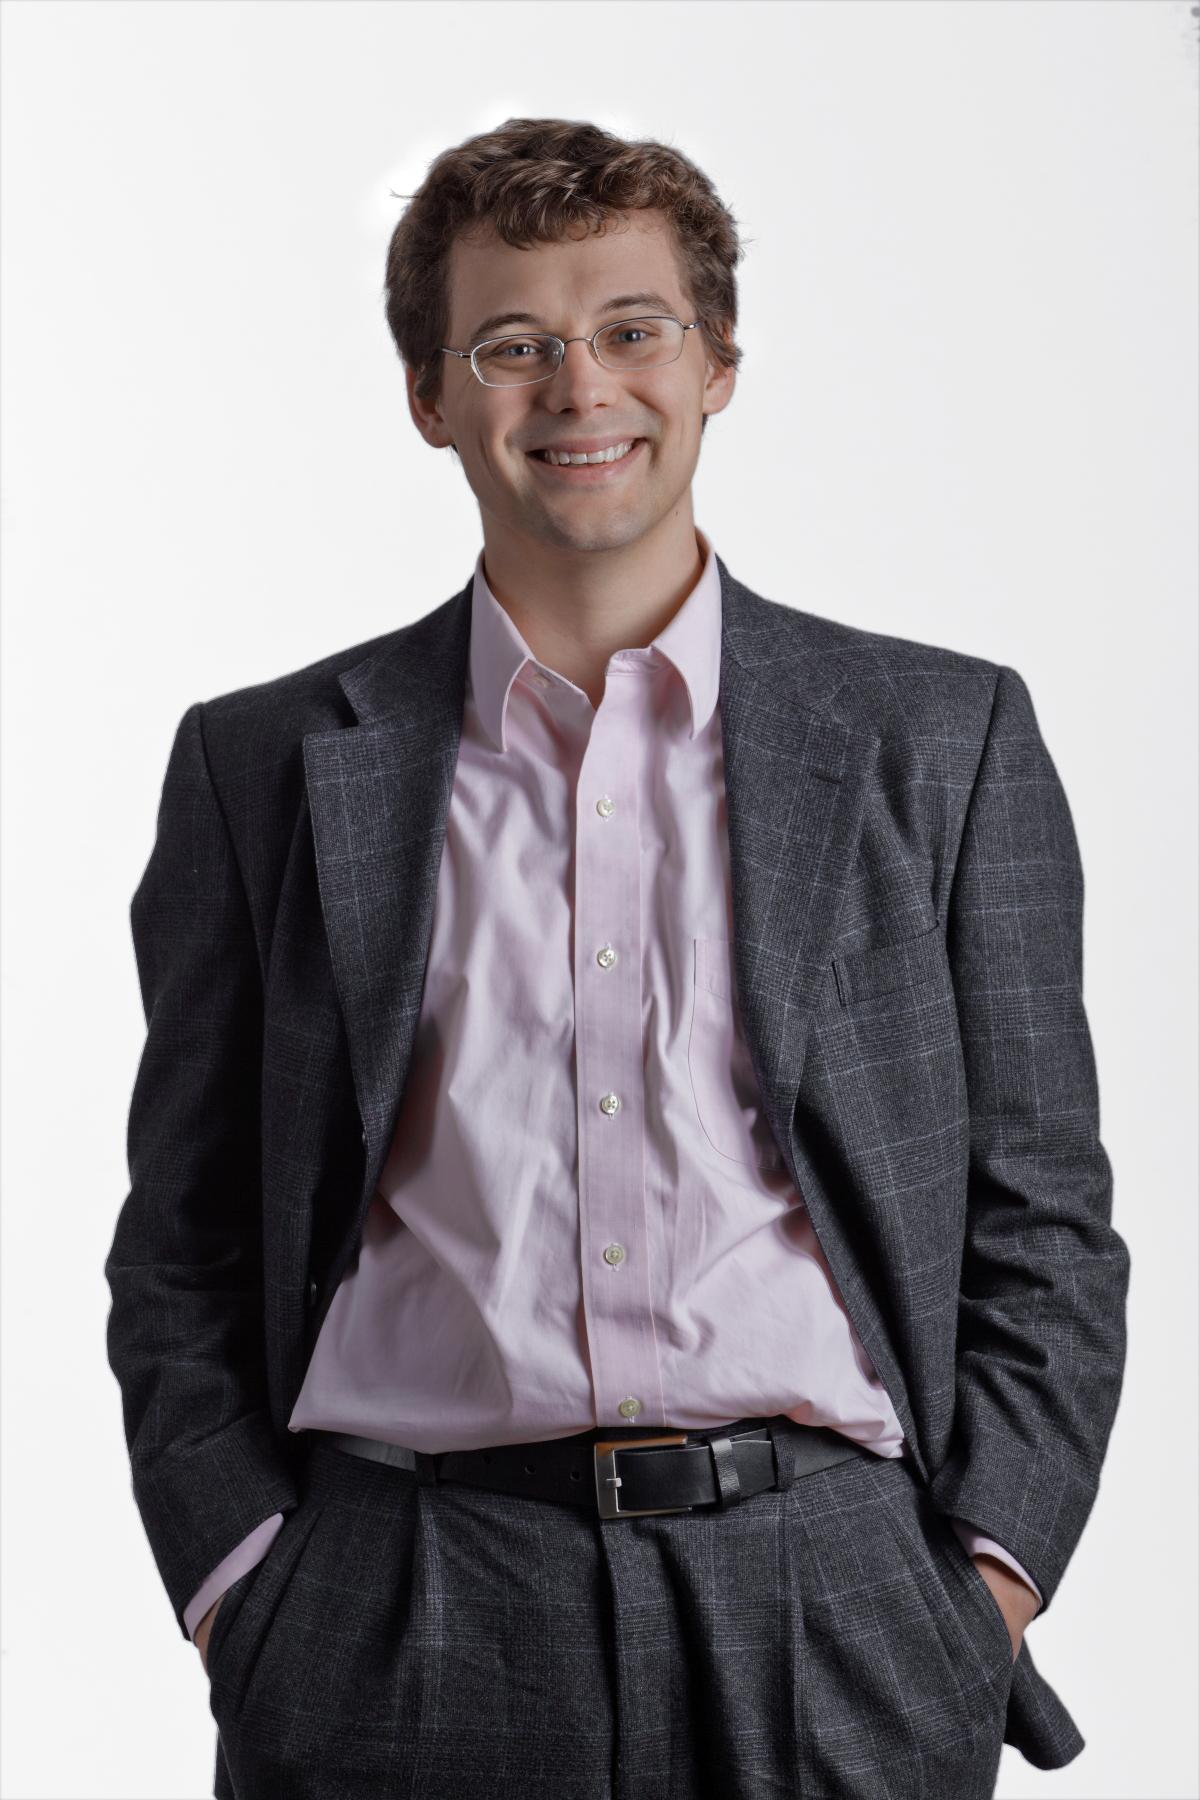 Professor Daniel Fredrickson Wins ACS ExxonMobil Award